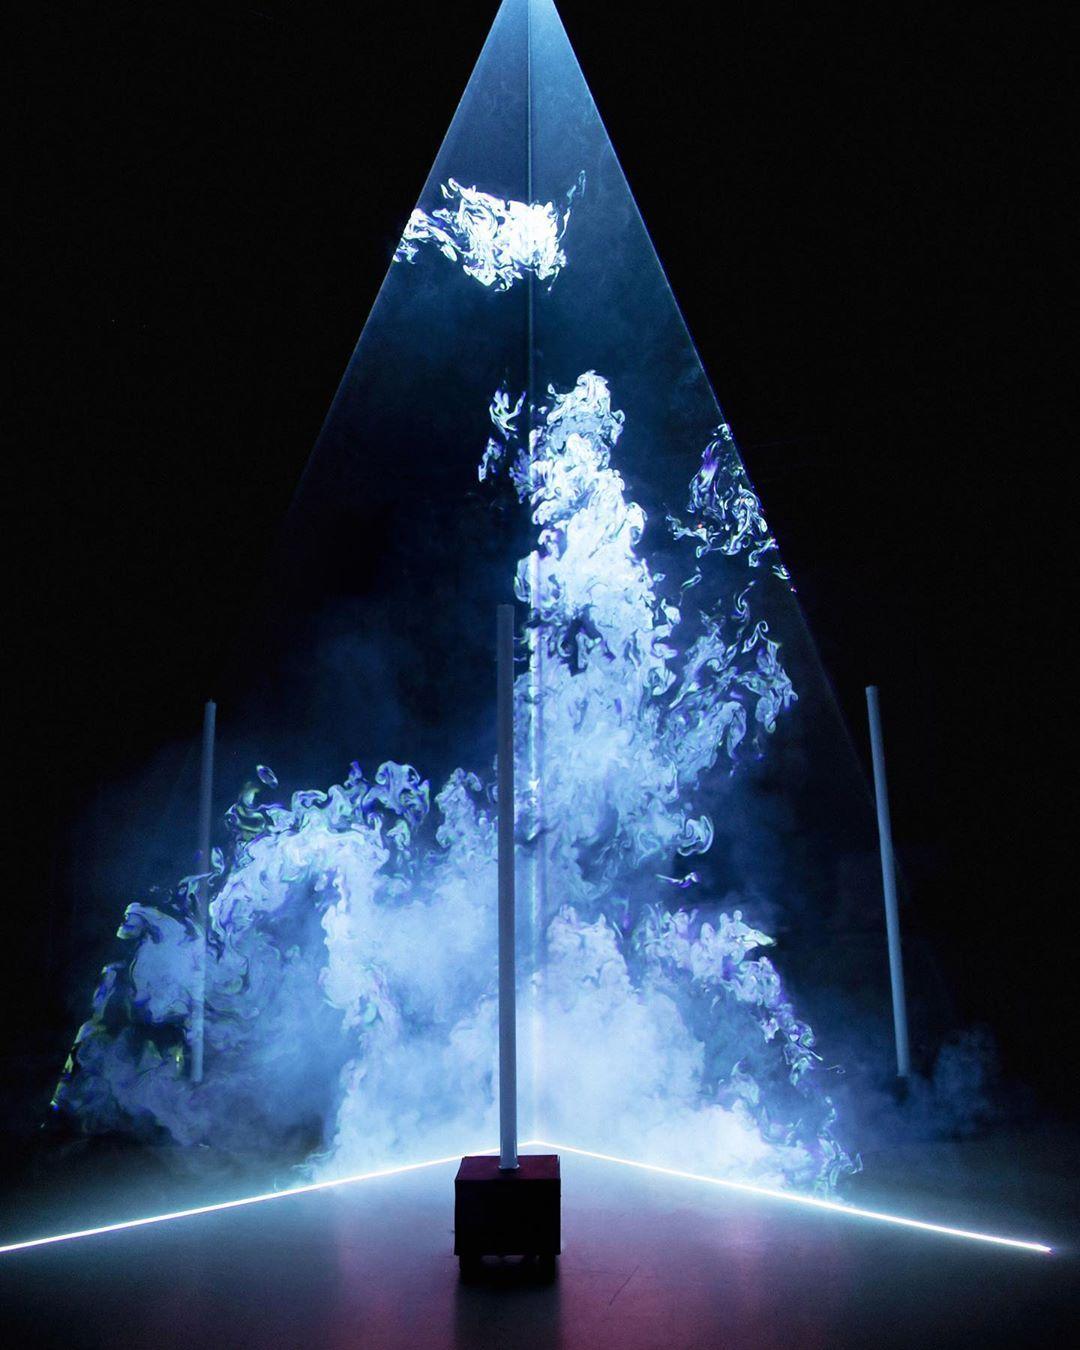 Ritual In 2020 Light Installation Christmas Tree Art Lighting Design Inspiration